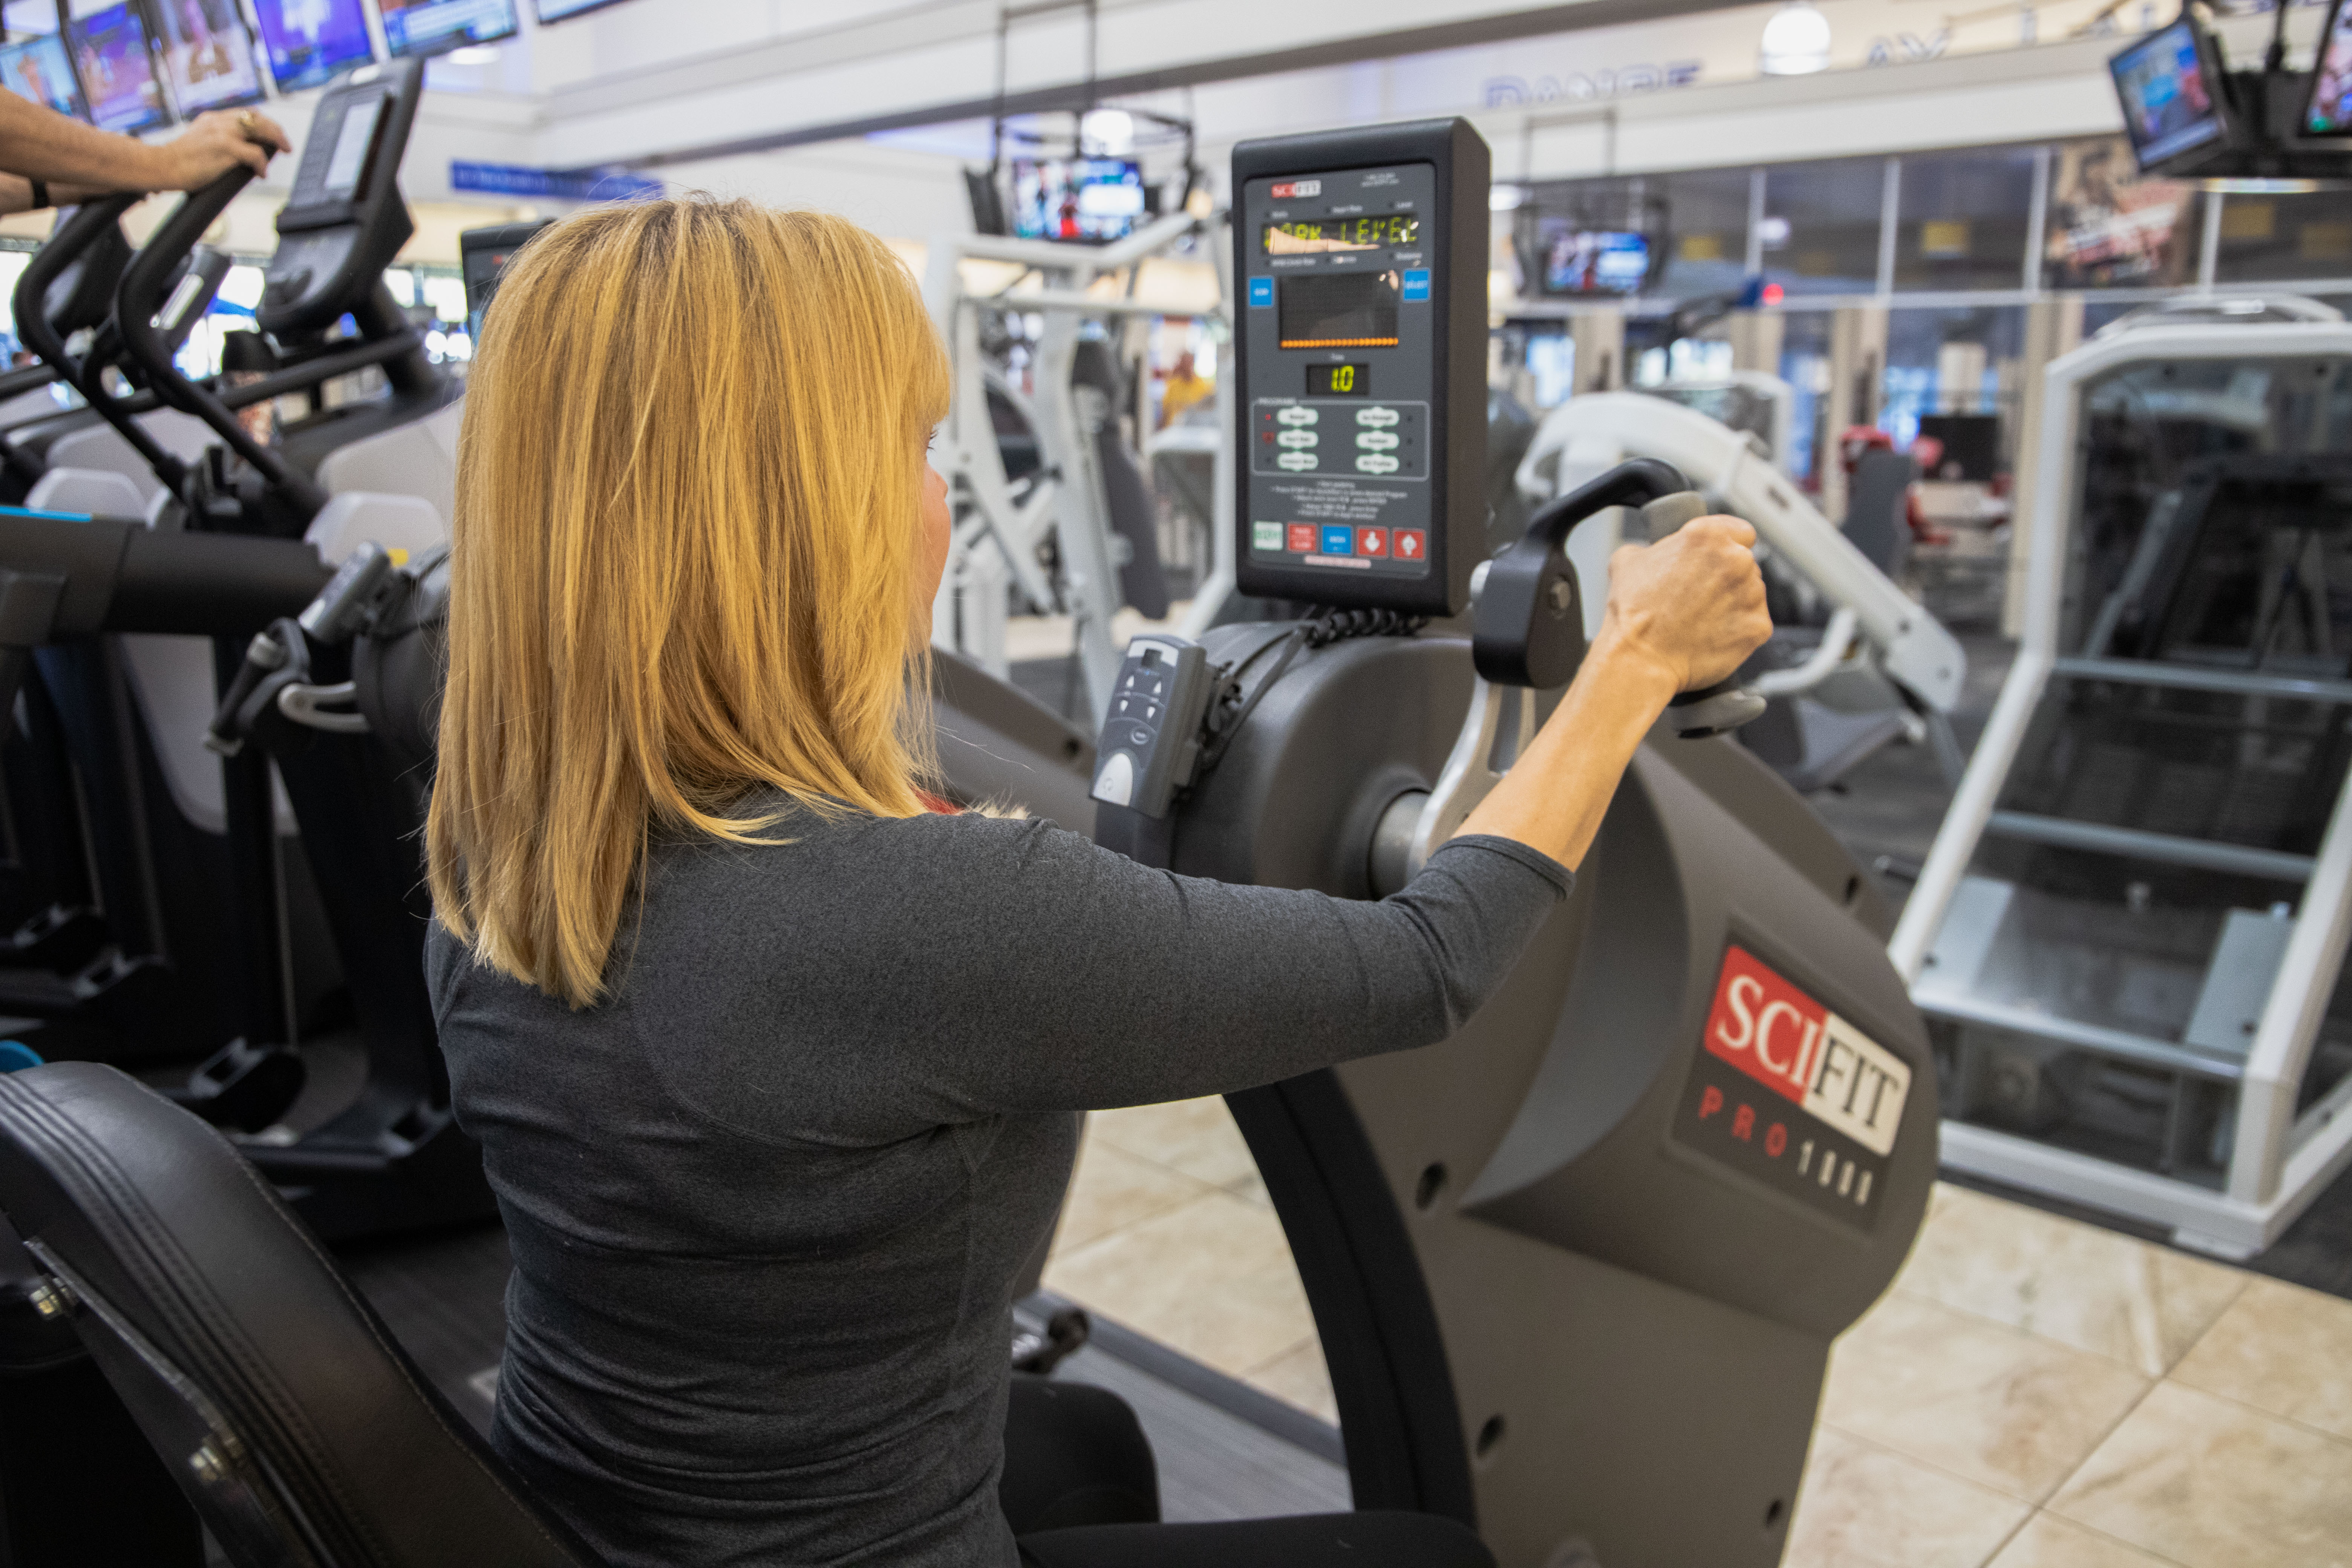 UBE  cardio machine